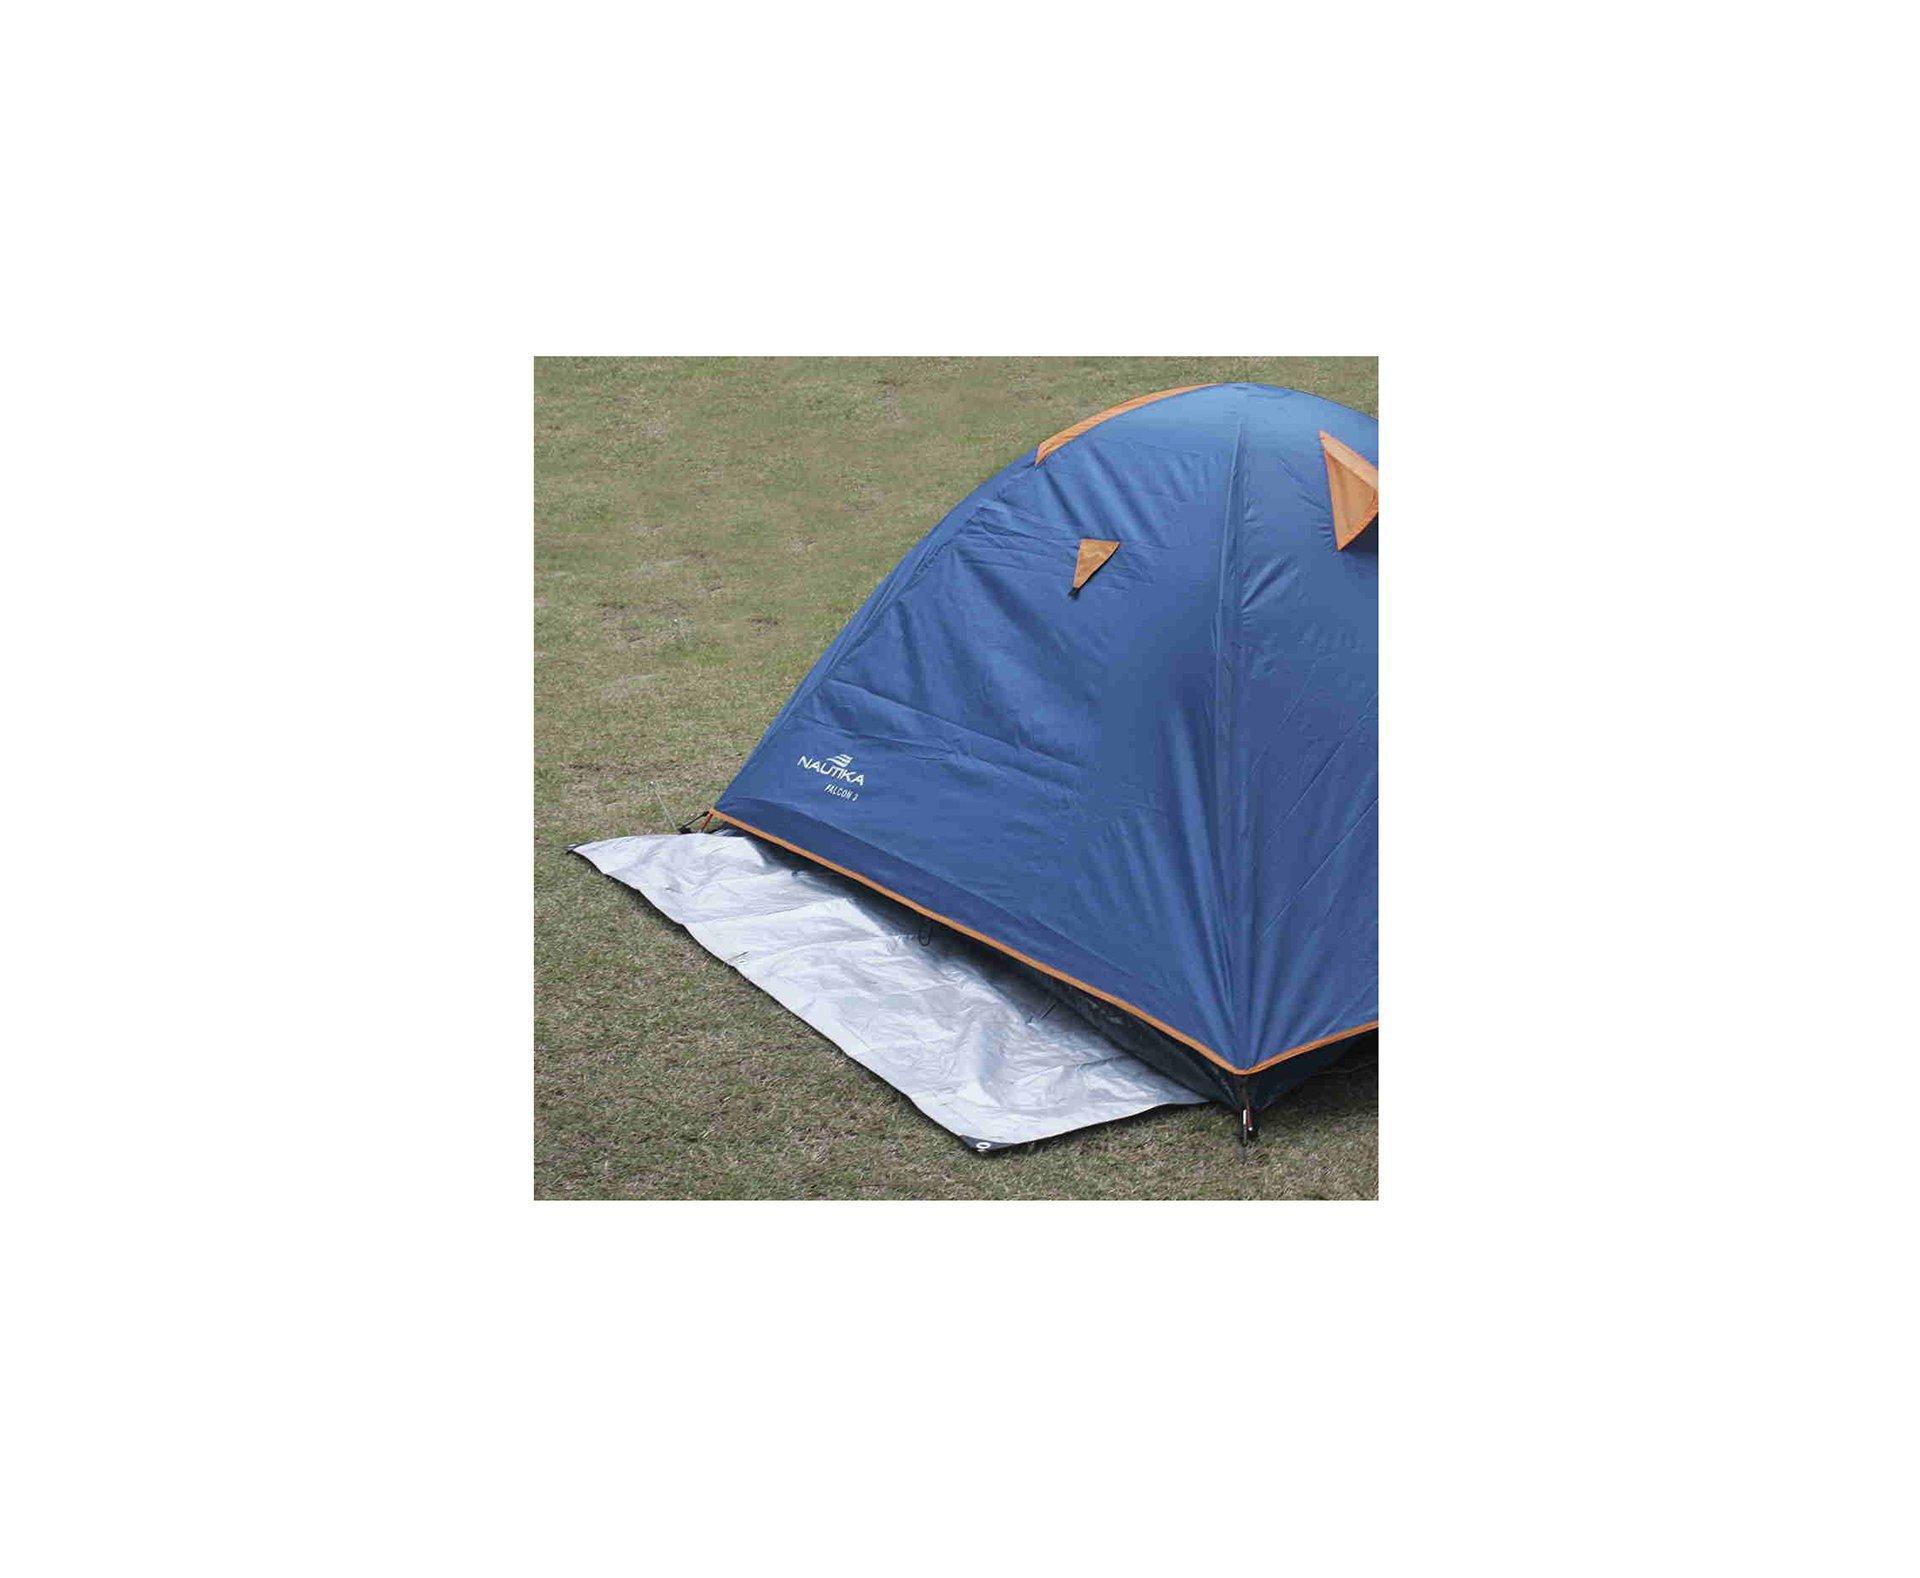 Lona Camping Multi-uso 4x3m - Nautika